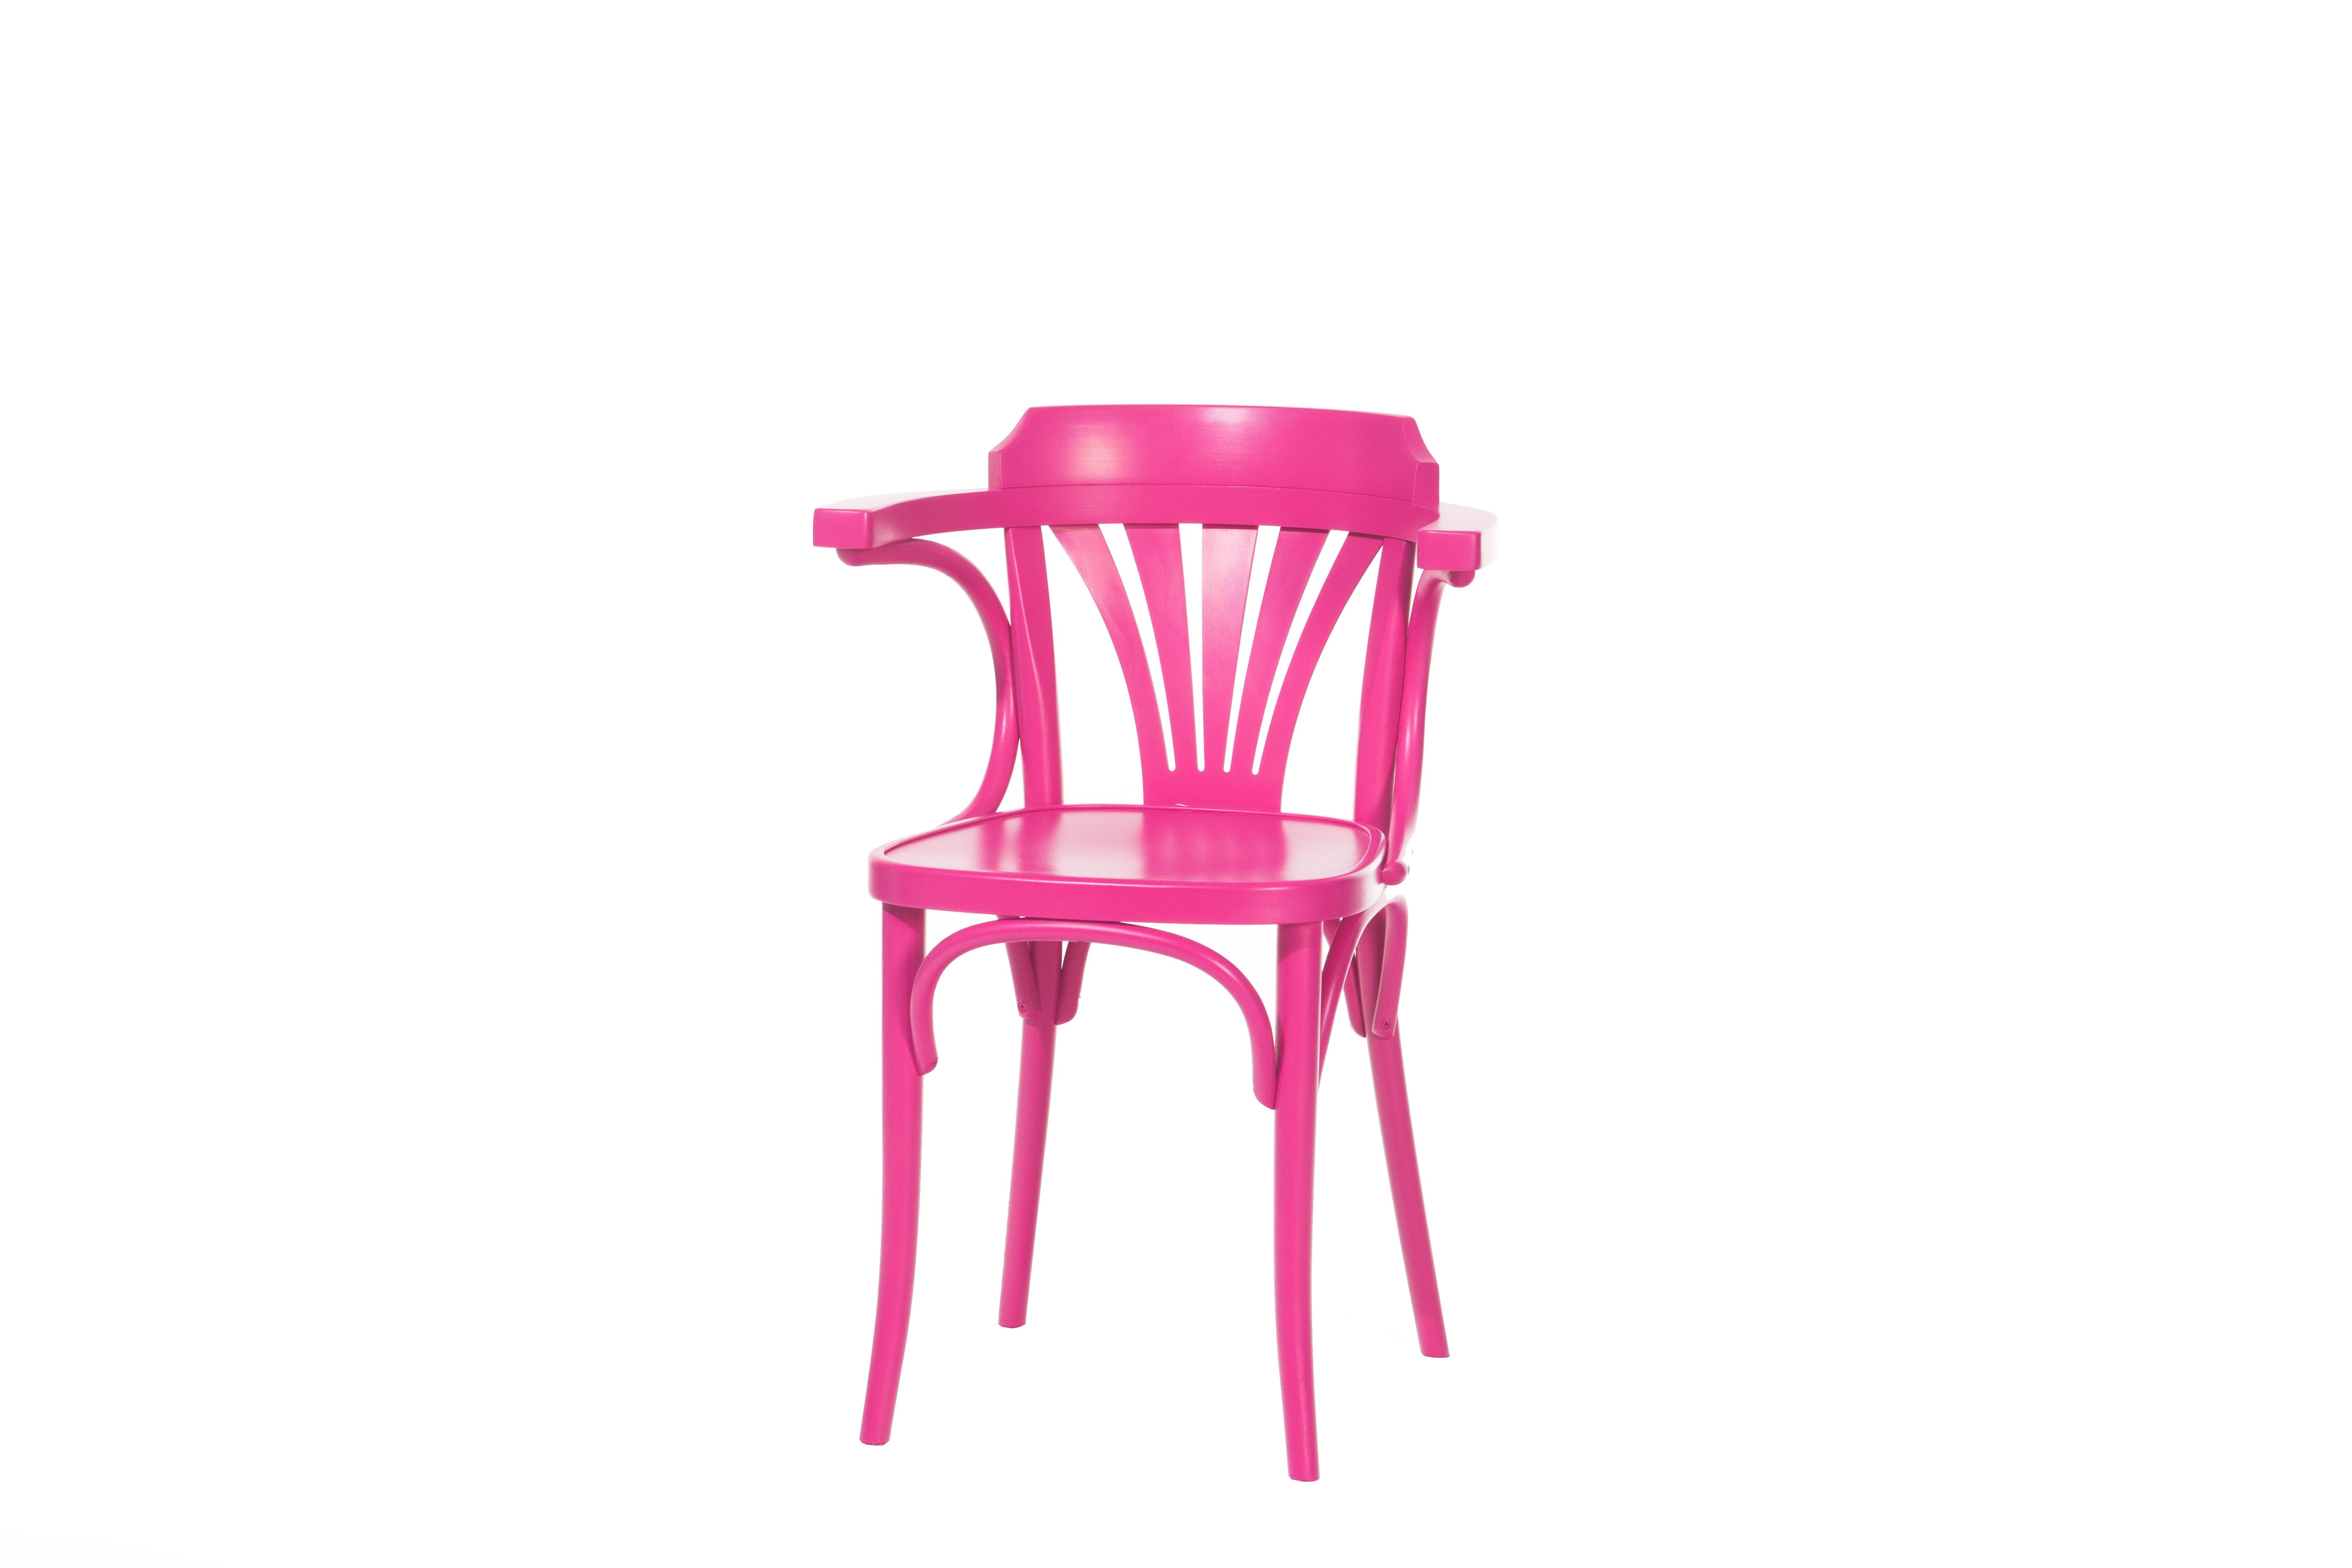 Scaun din lemn de fag 24 Pink, l54xA48xH77 cm